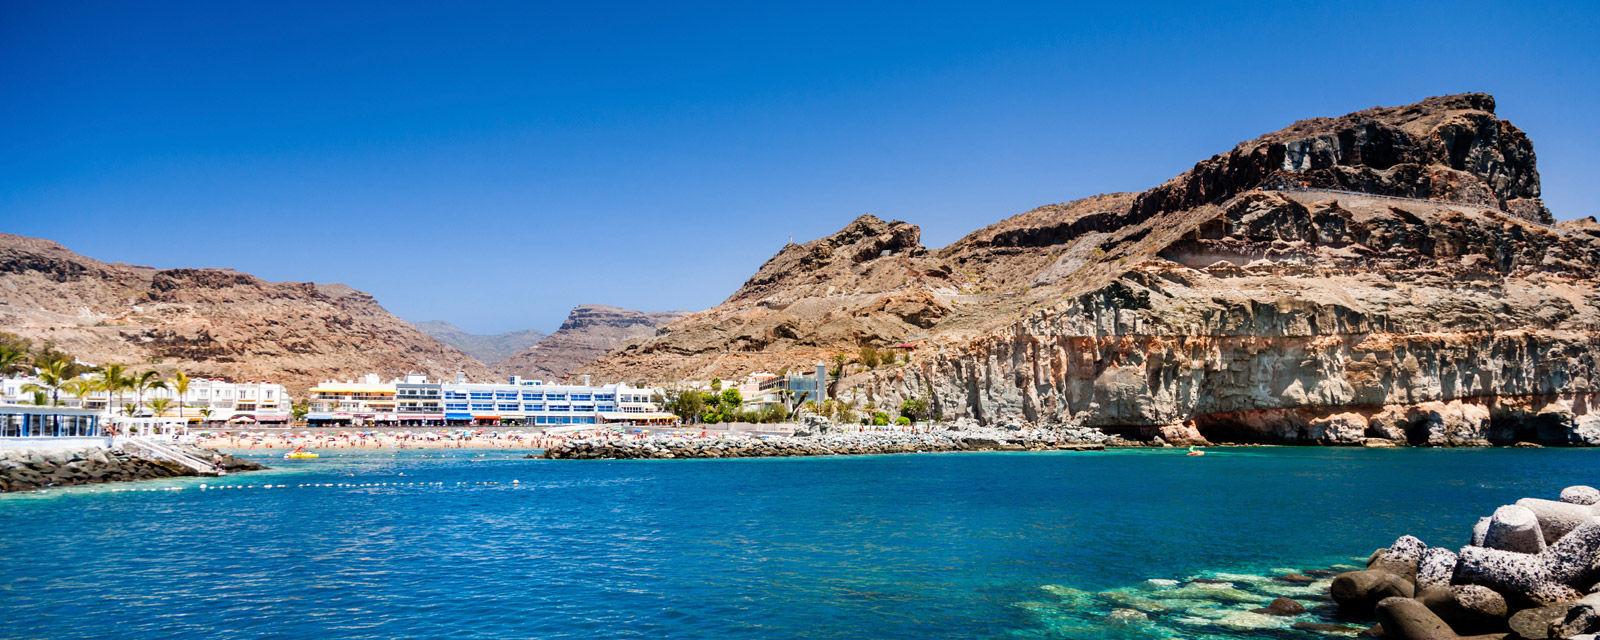 ¿A qué archipiélago pertenece la isla de Gran Canaria?